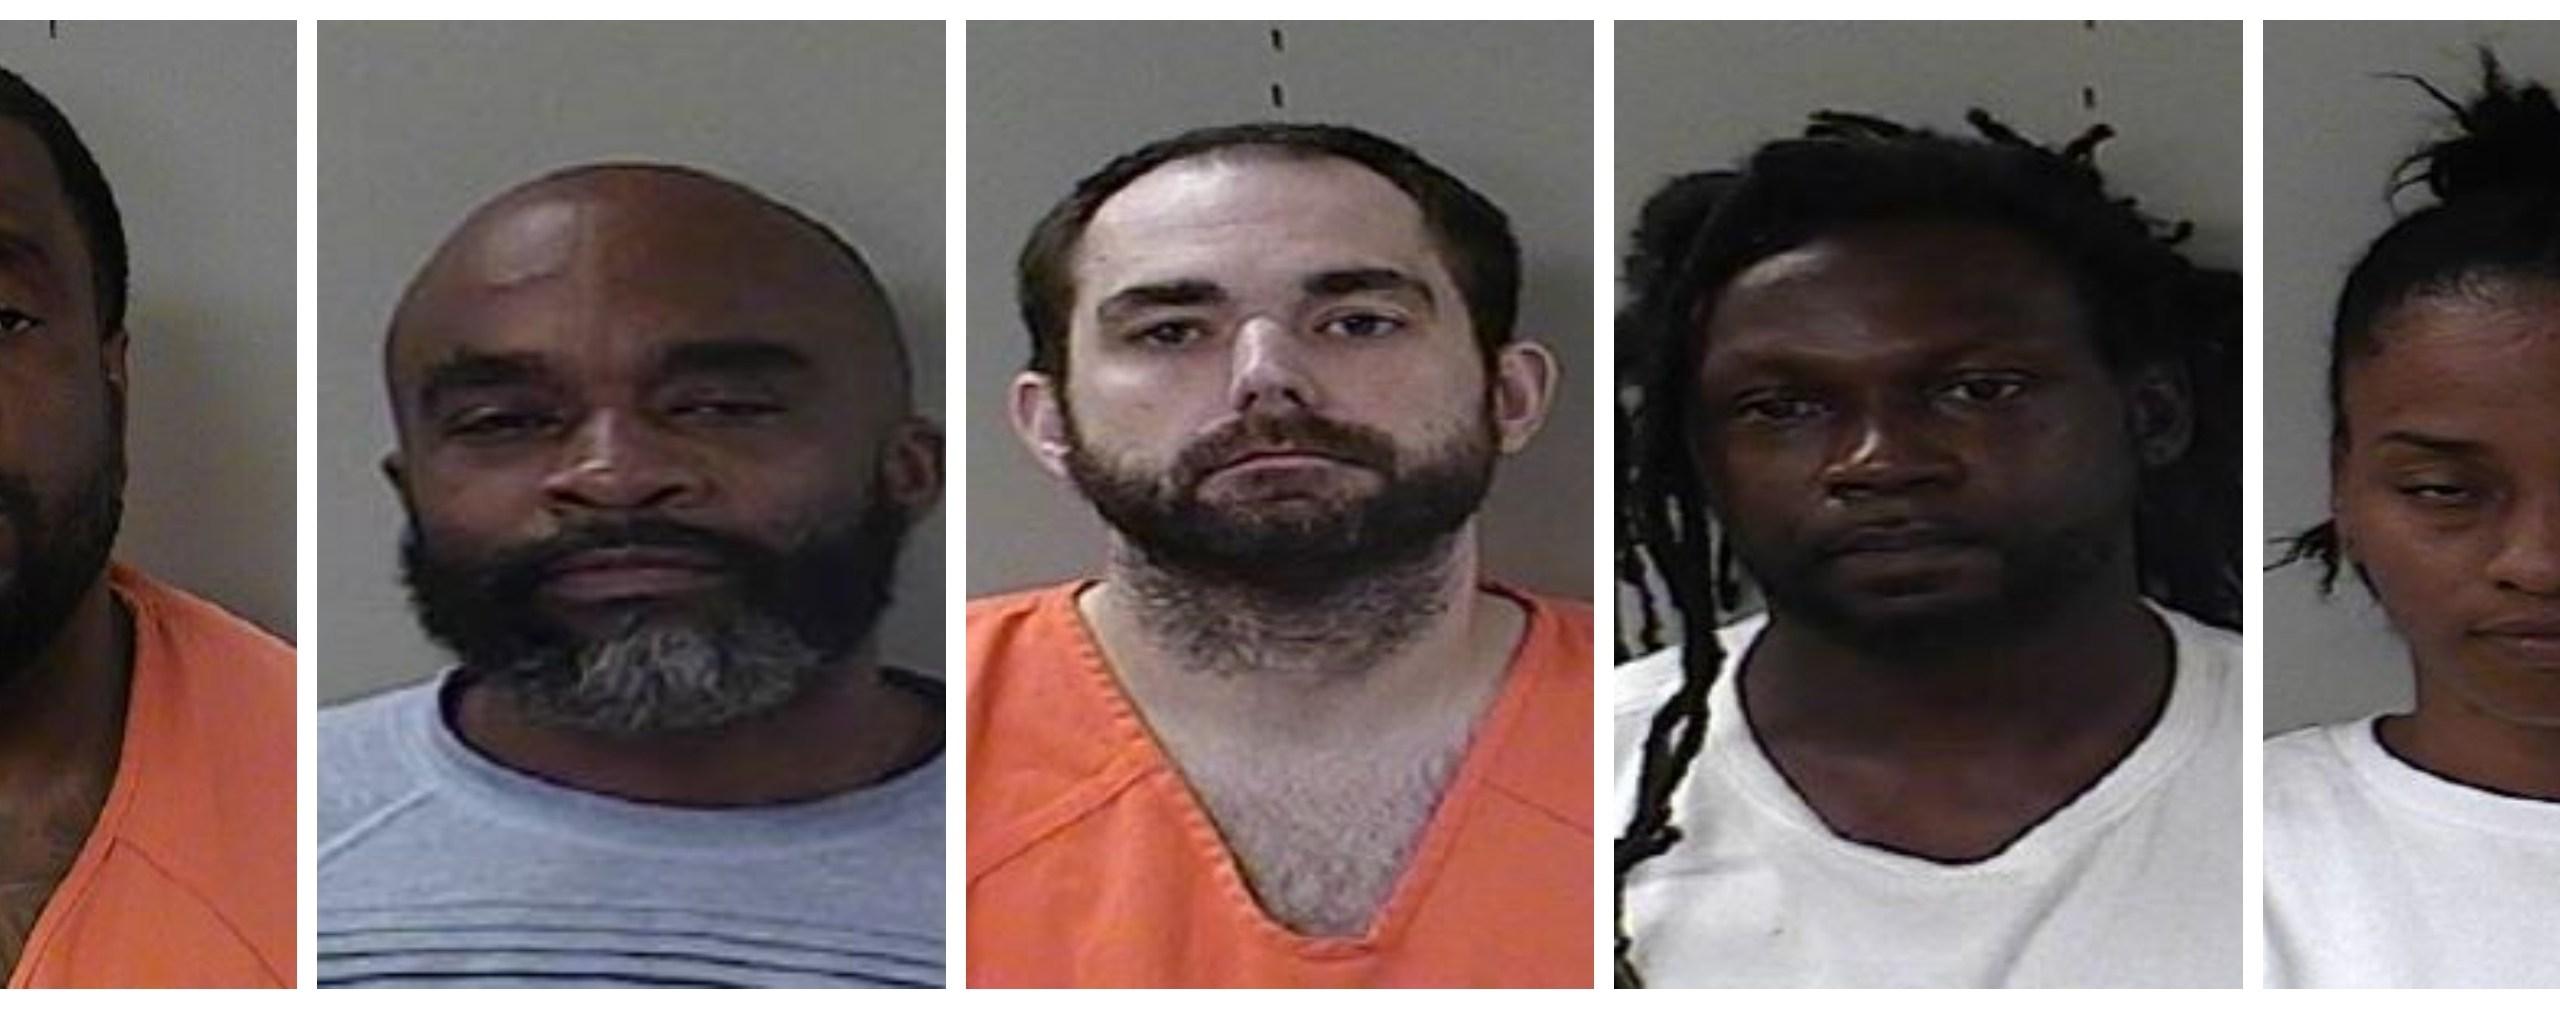 Murfreesboro Drug investigation_1560542719272.jpg.jpg